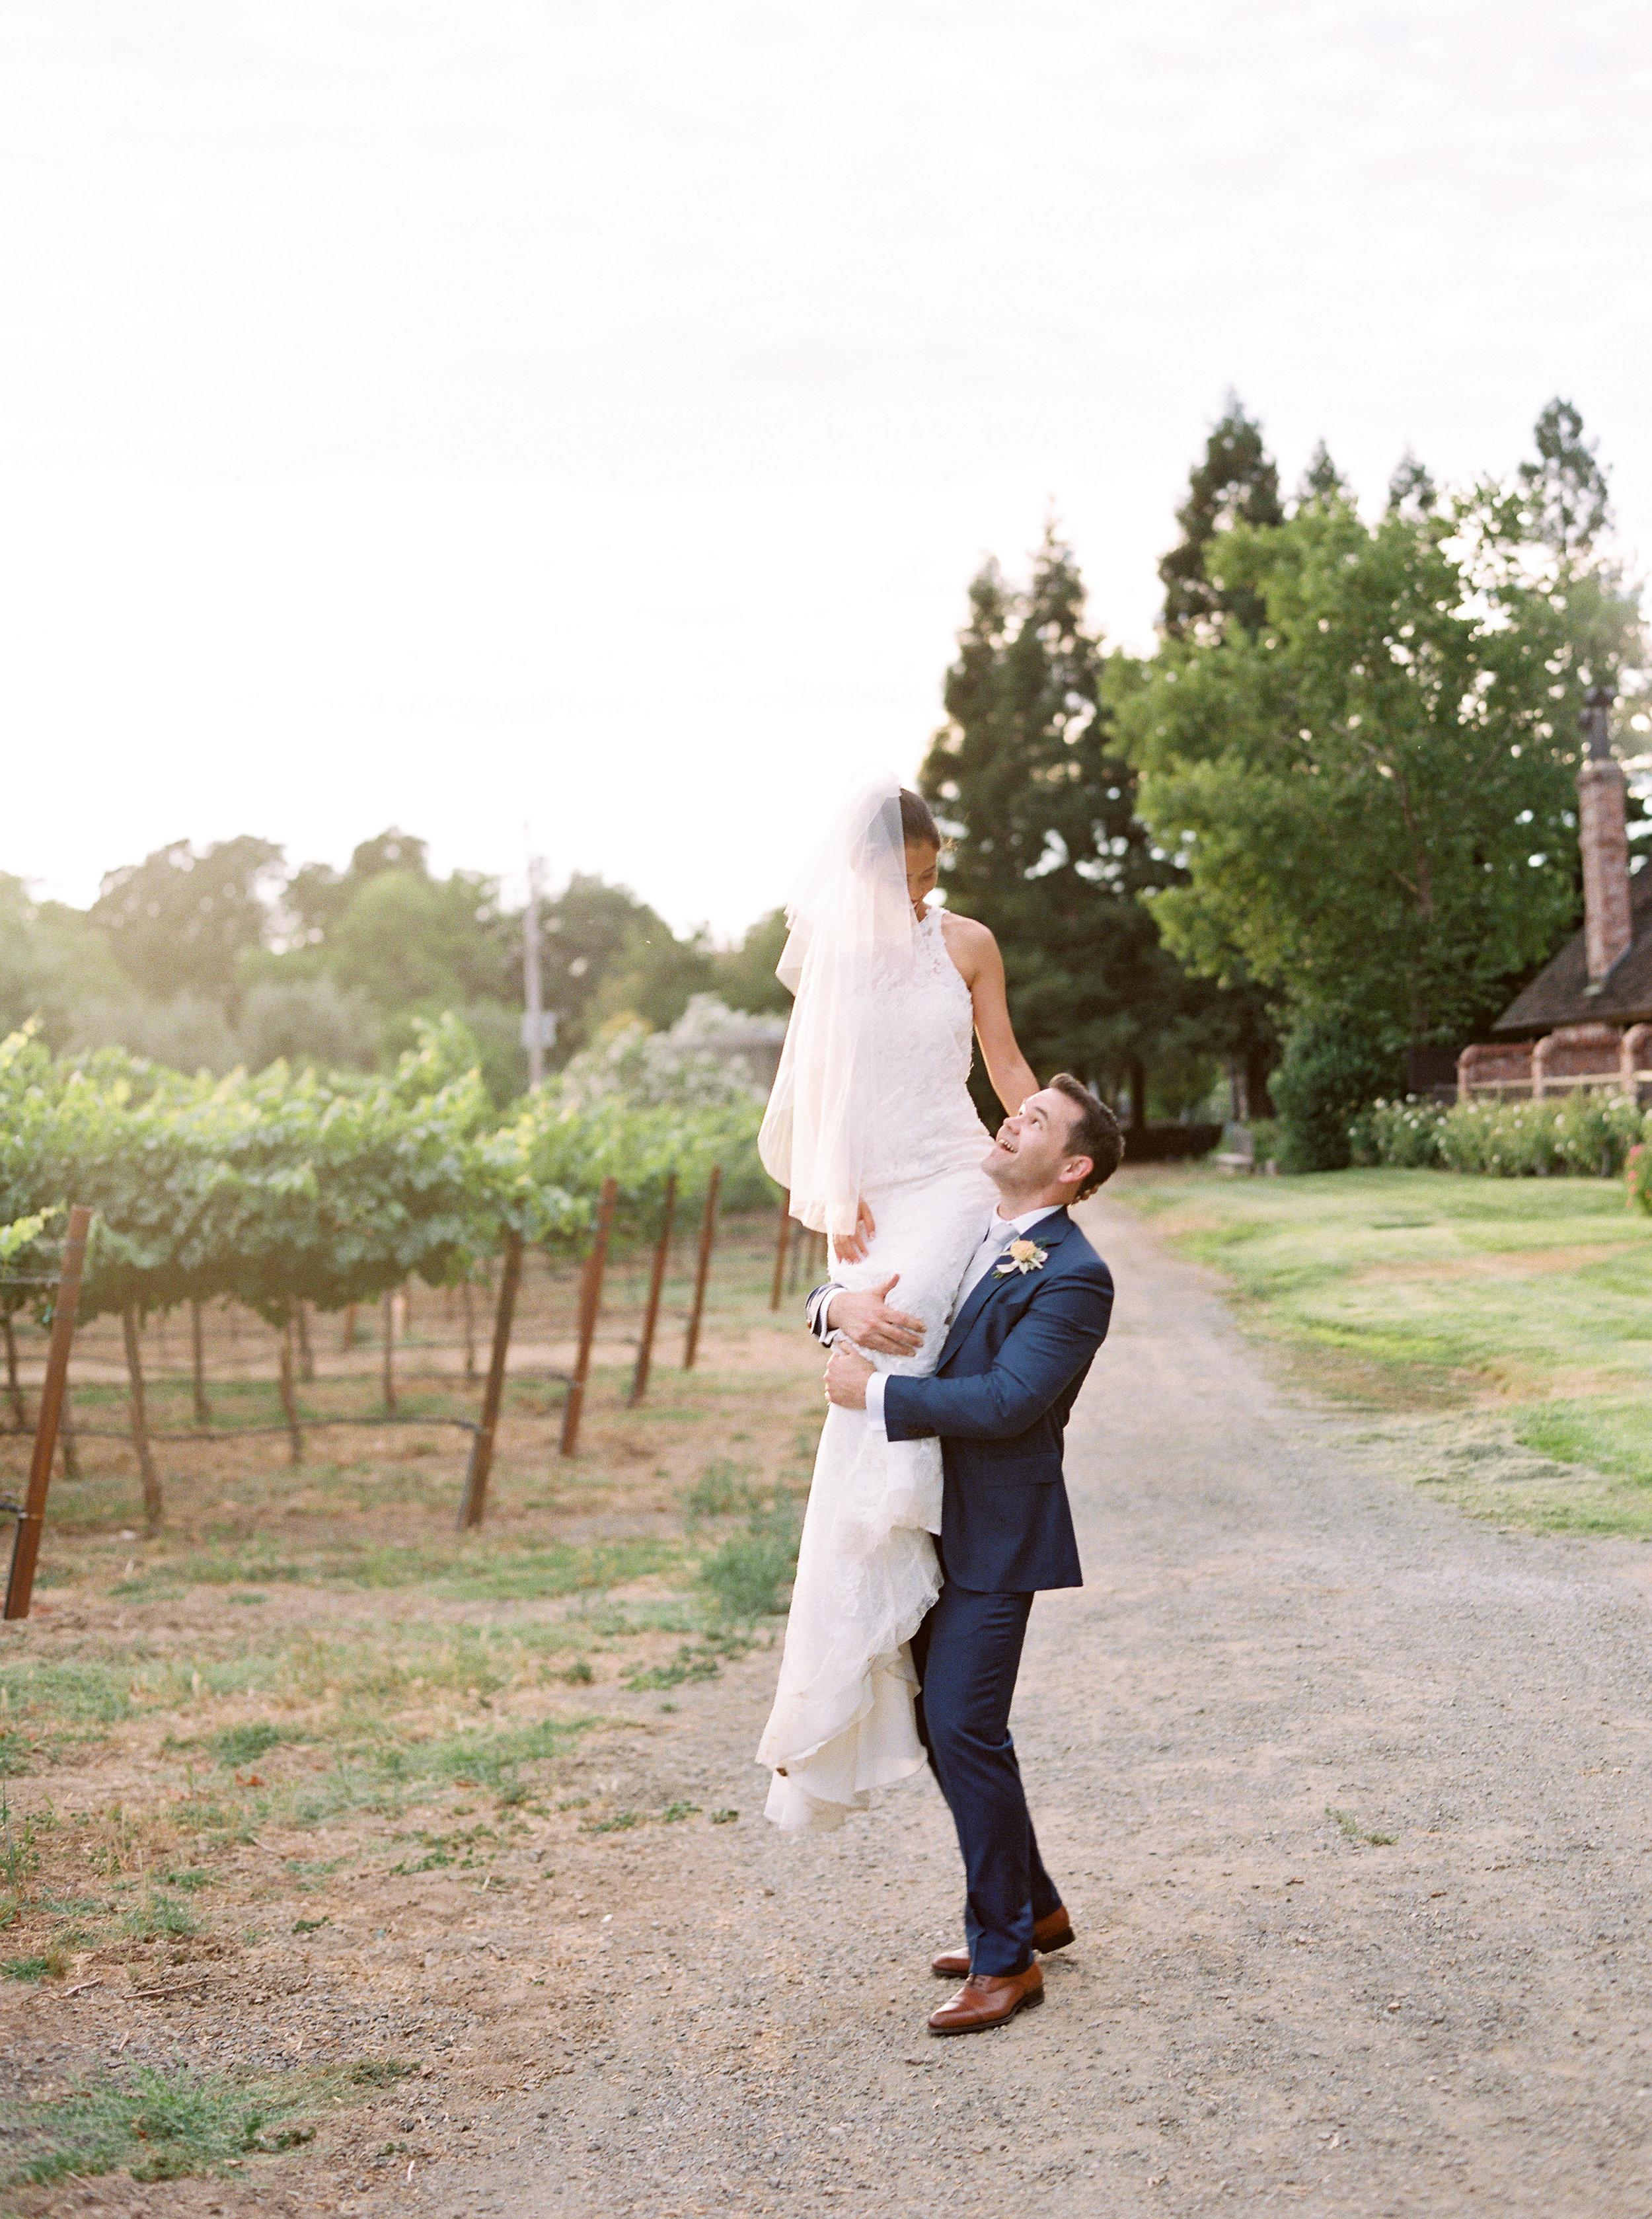 Harvest-inn-wedding-in-napa-california-11.jpg